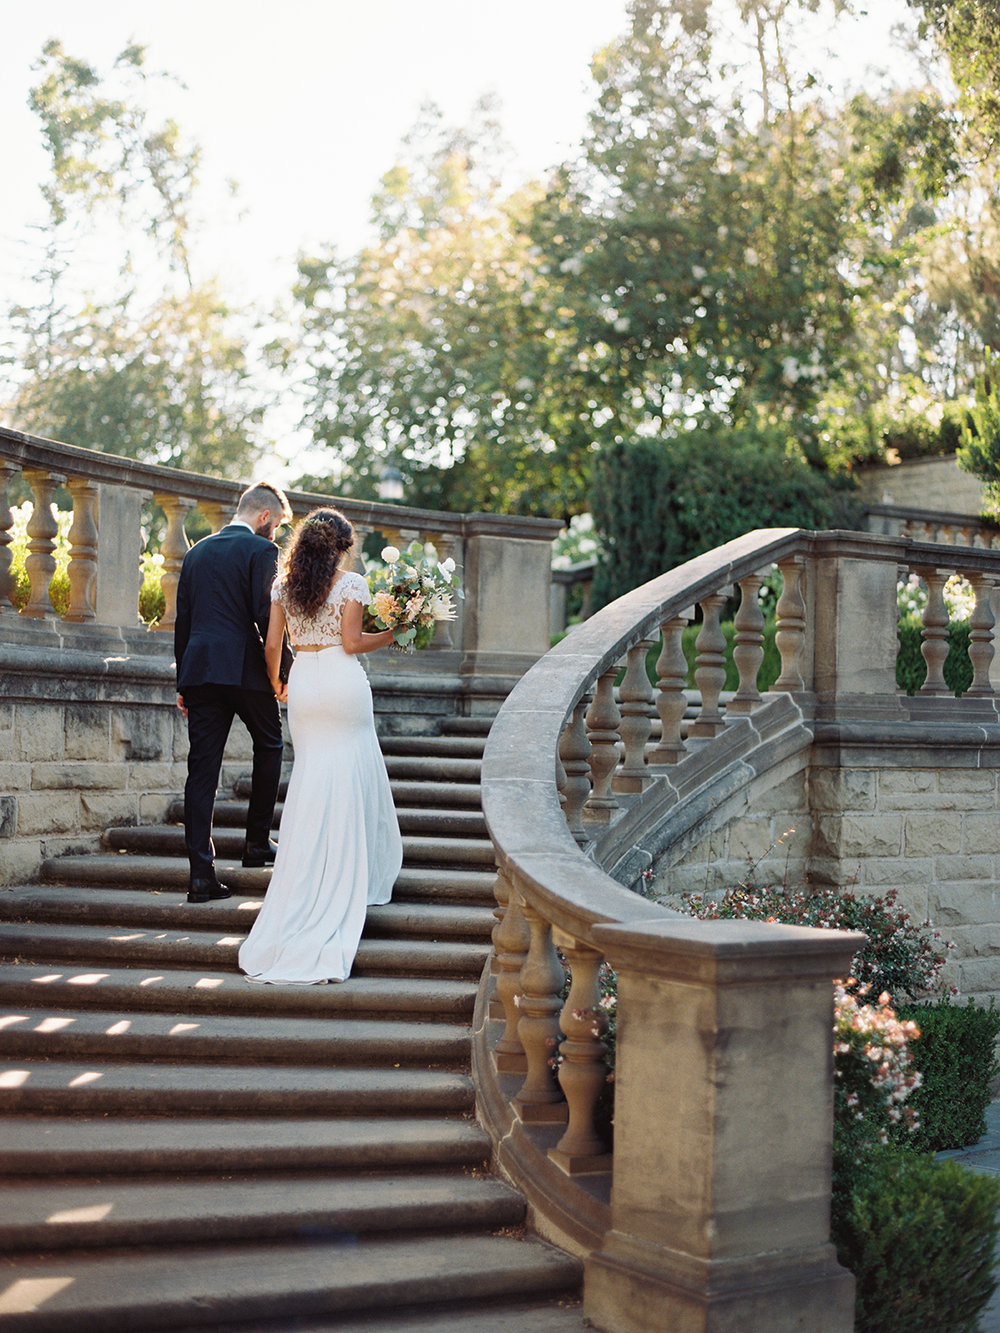 143-brian-sarra-los-angeles-wedding-brumley-wells-photography.jpg